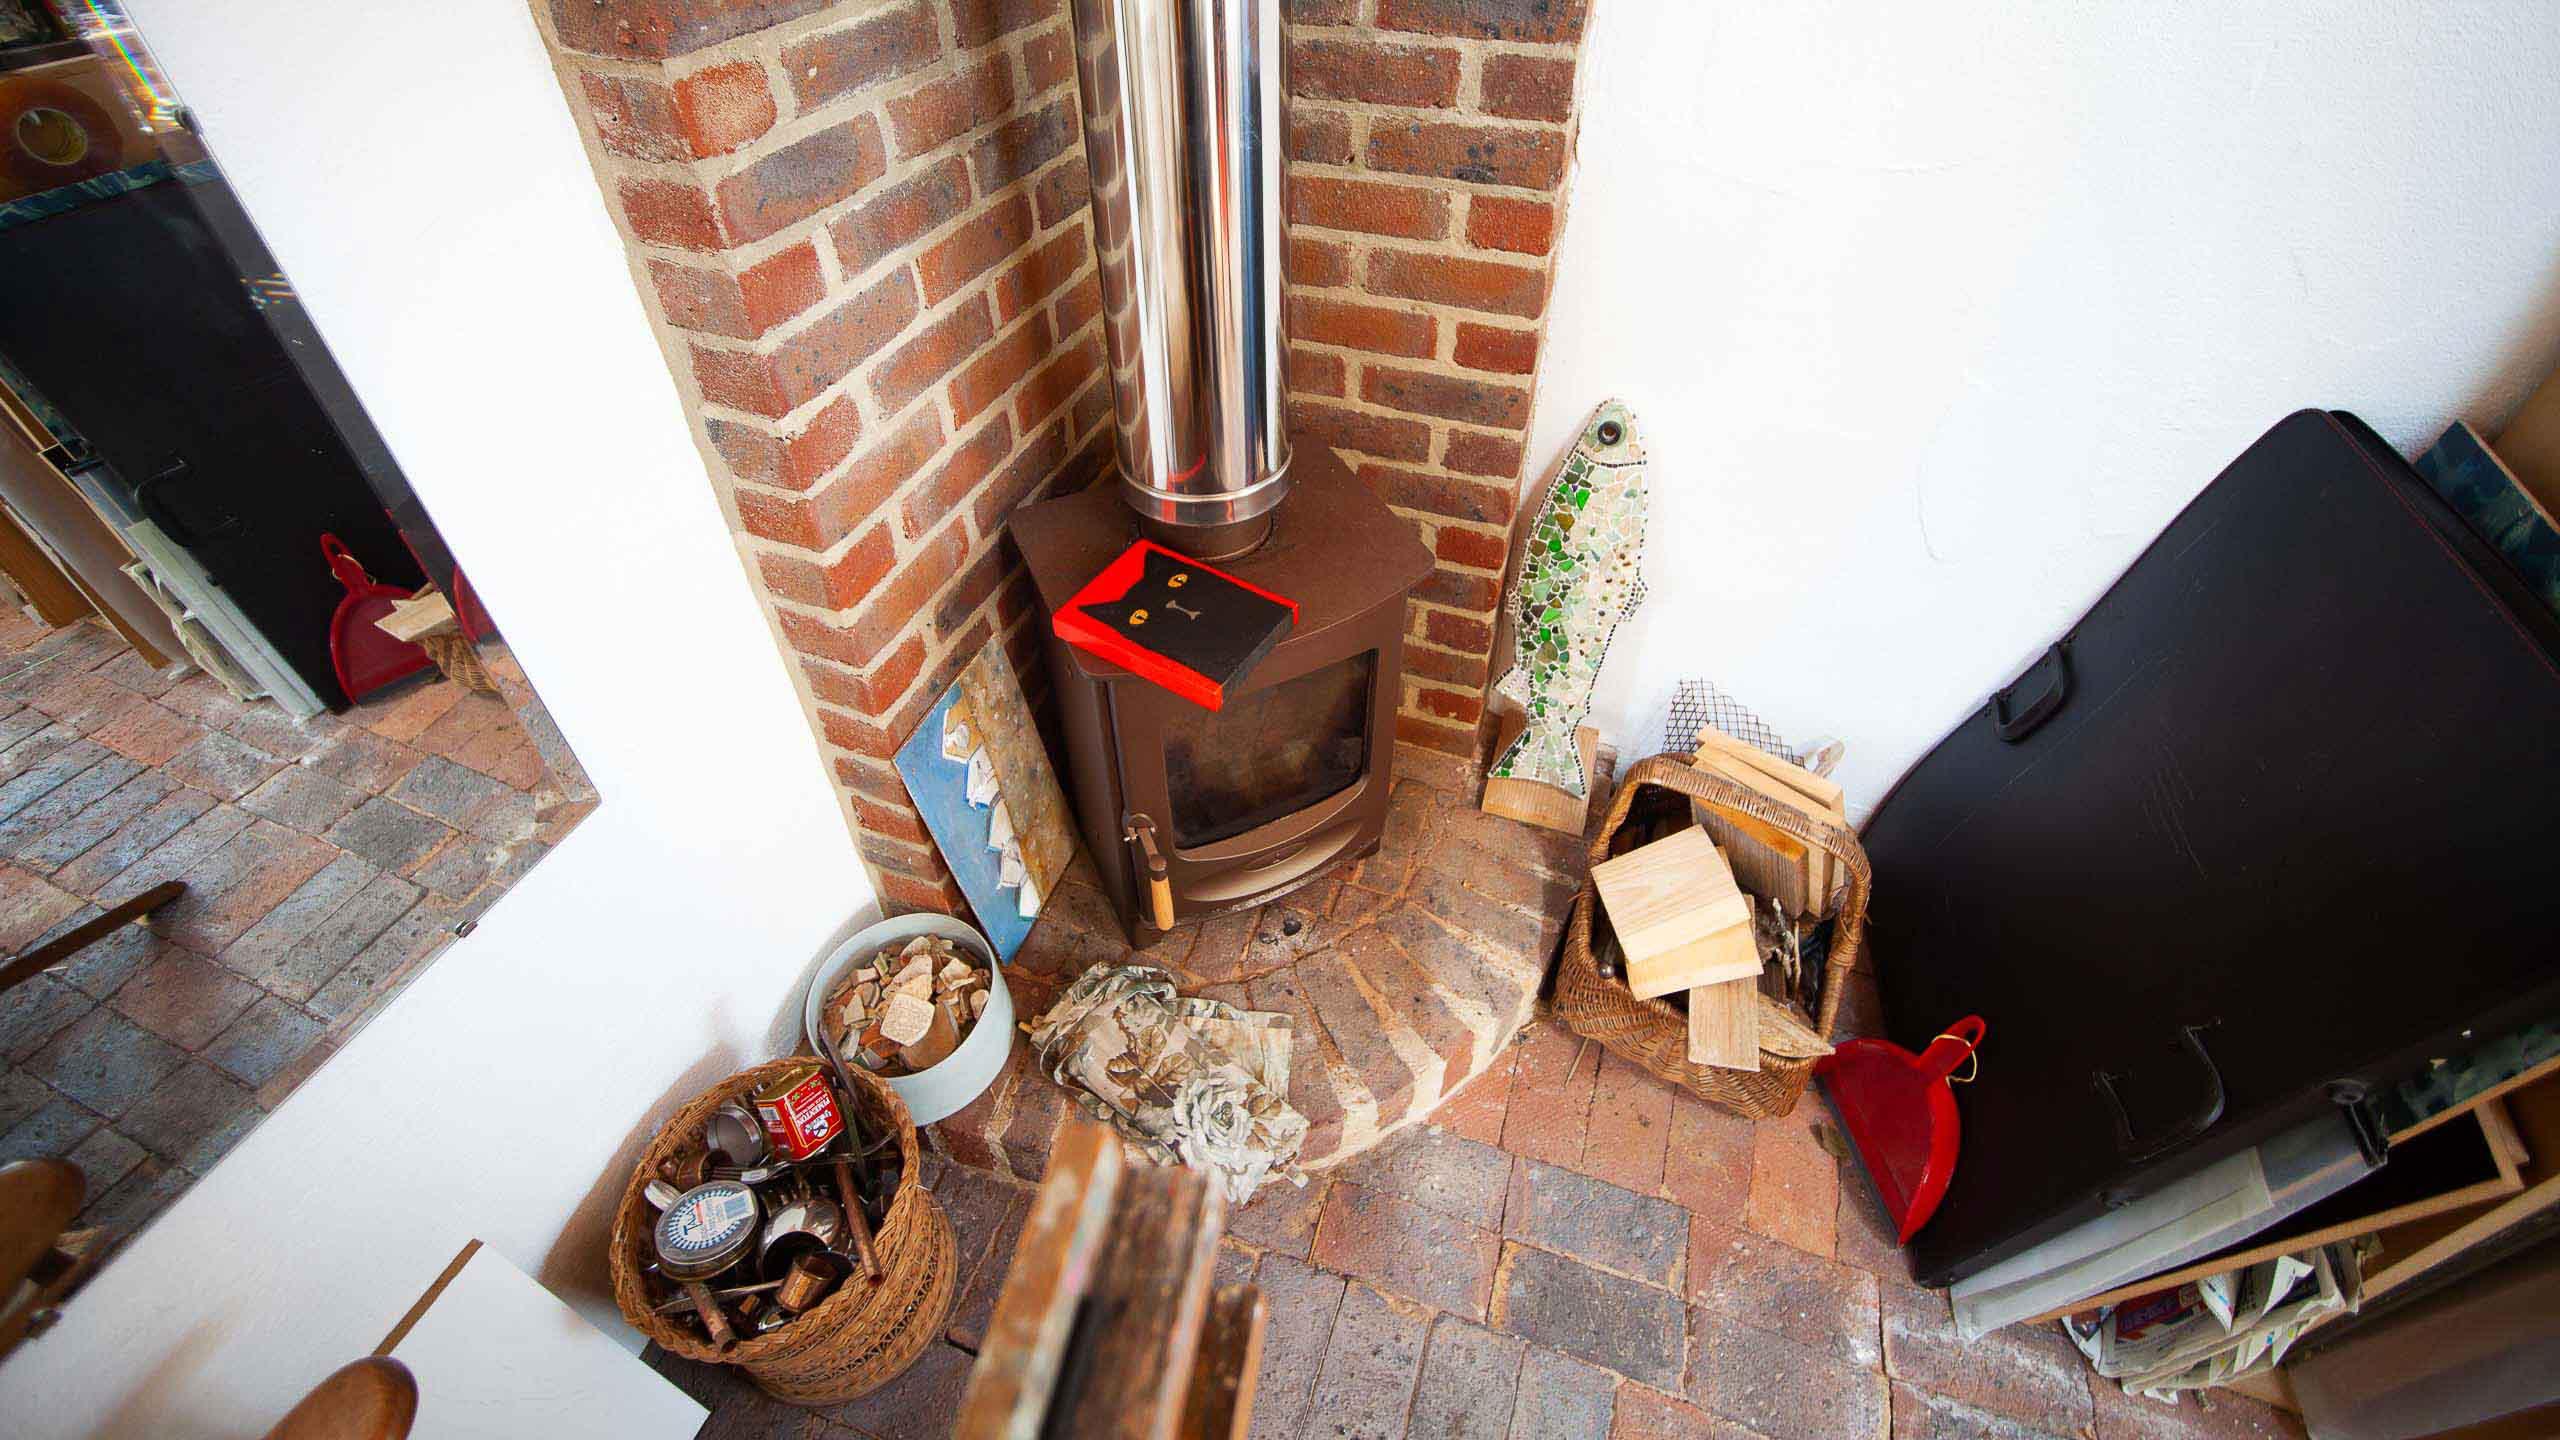 wood burning stove in garage conversion studio - building work by RJ Steele builders in Sussex